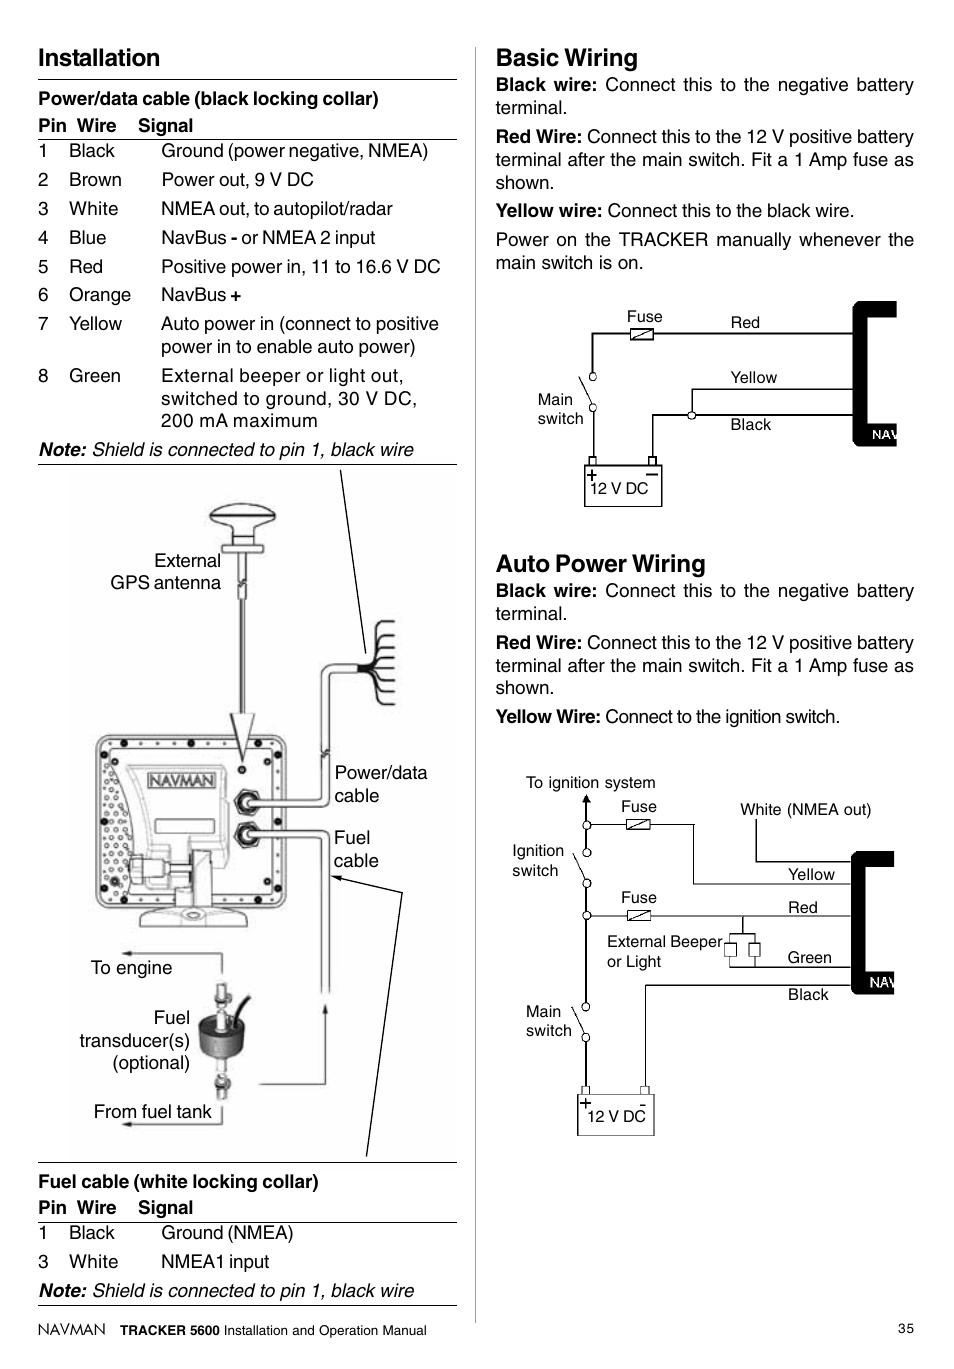 installation auto power wiring basic wiring navman tracker rh manualsdir com Garmin GPS Wiring-Diagram Garmin Marine Chartplotter Wiring-Diagram